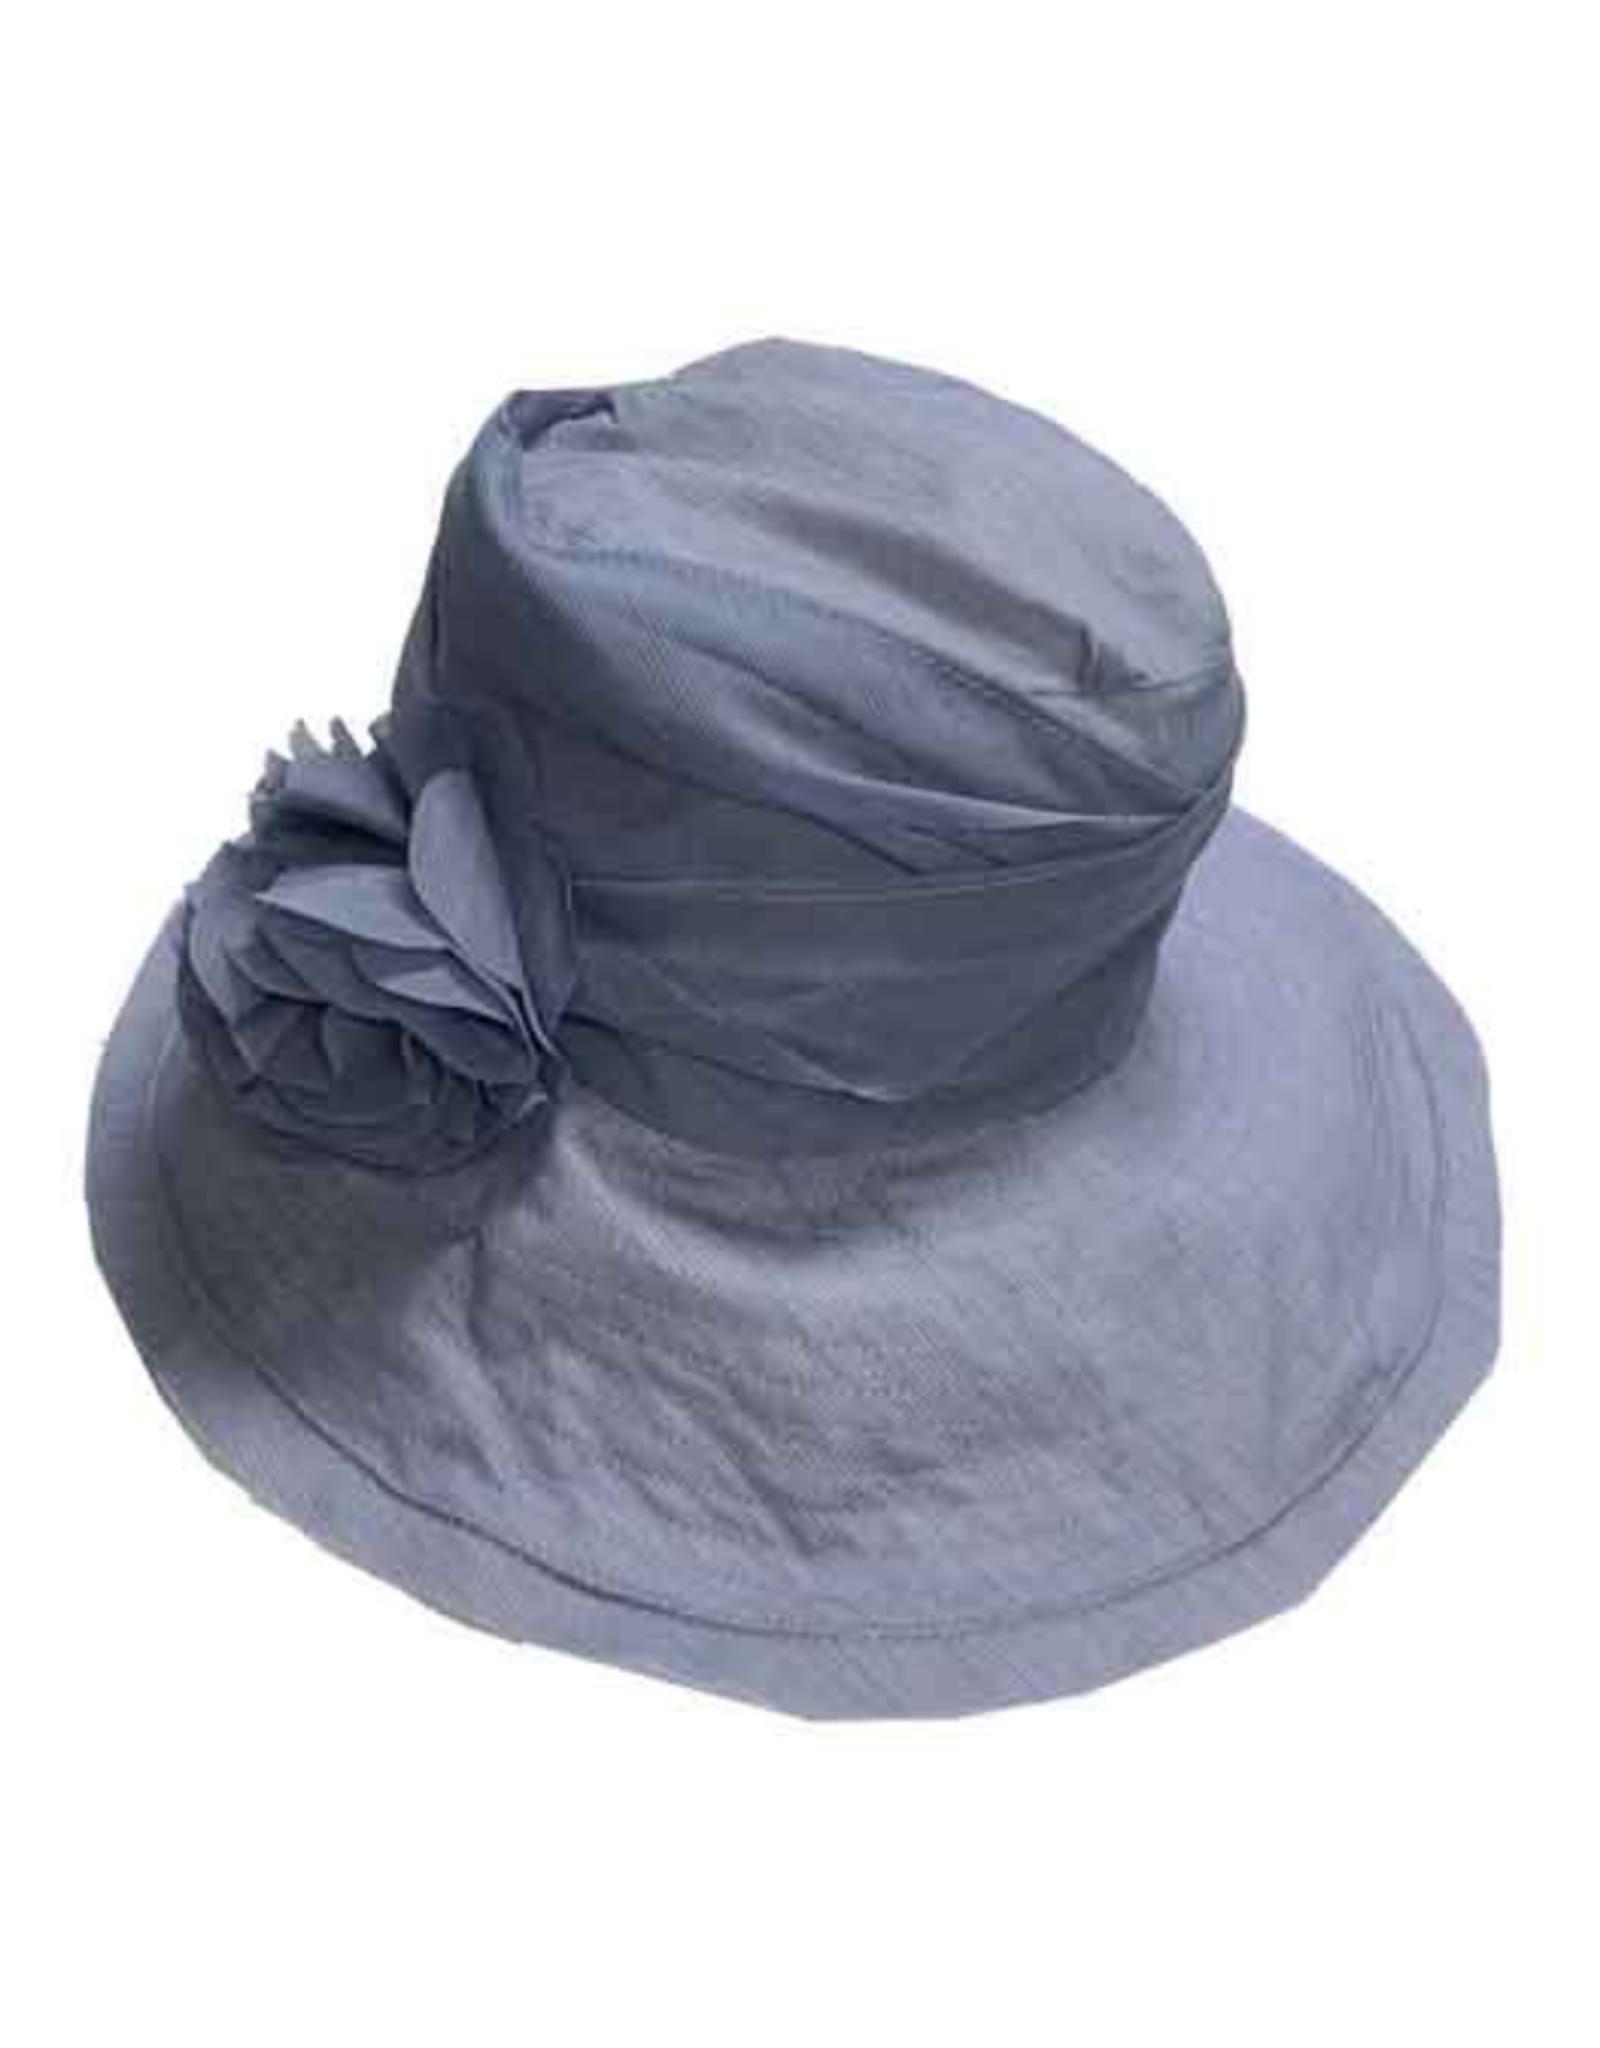 "HAT-BUCKET, 4.5"" SLANTED BRIM, PLEATED CLOTH BAND"